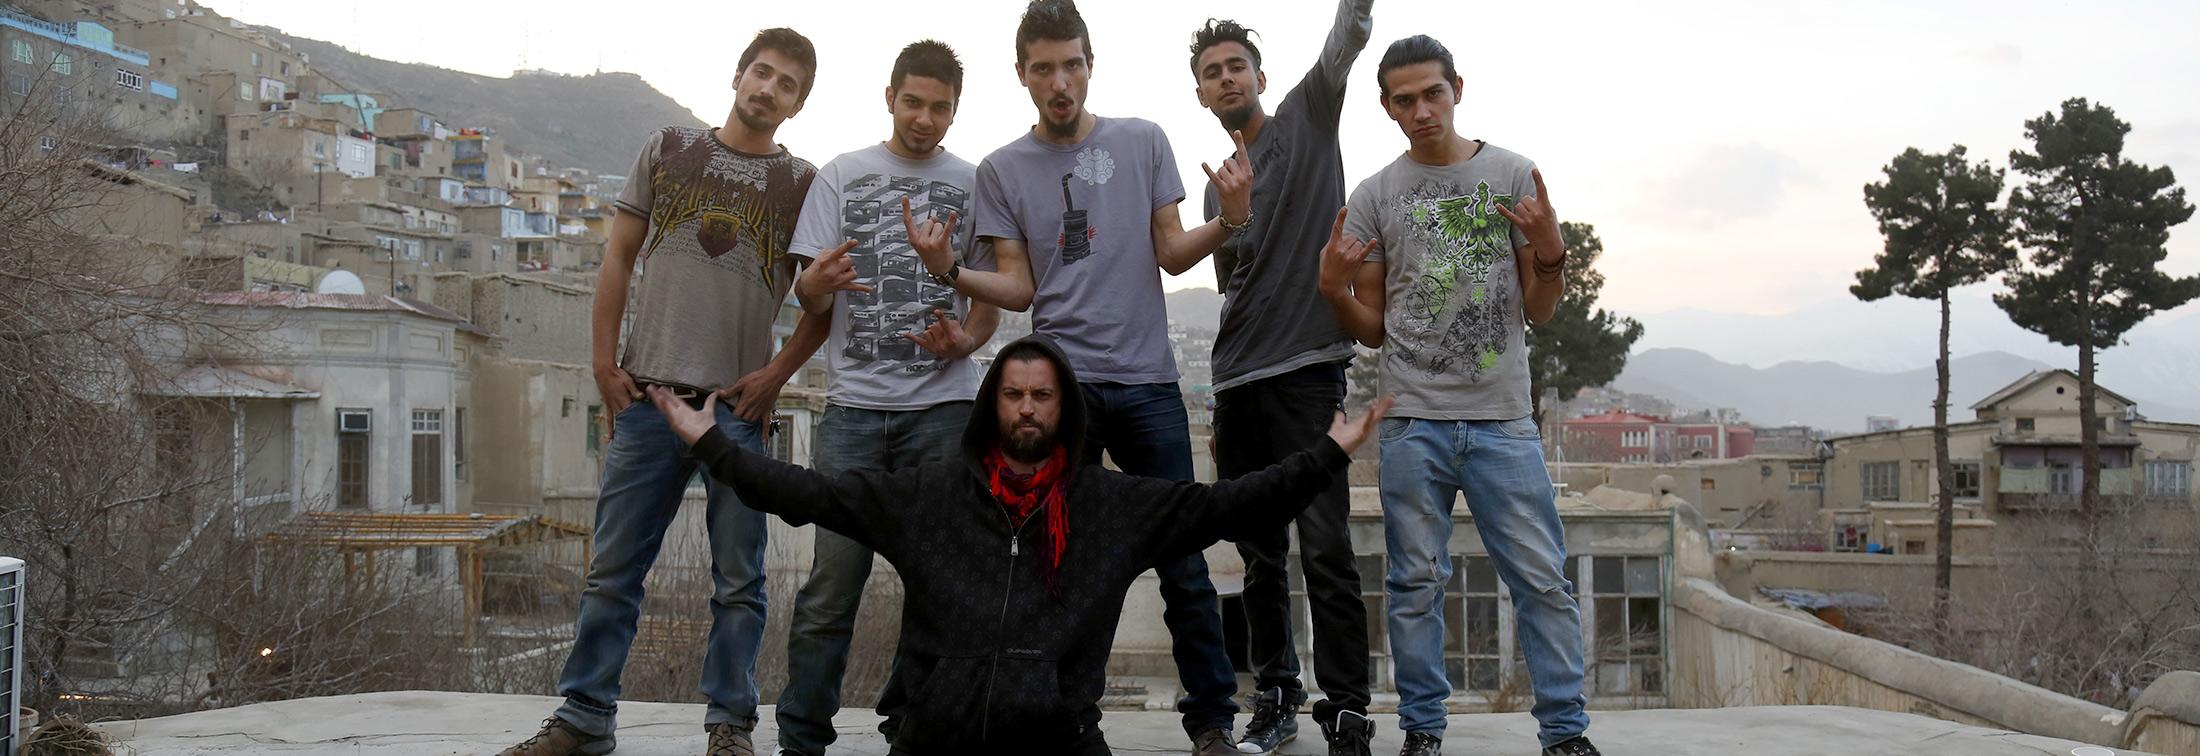 Rockabul - Travis Beard on documenting Afghanistan's first heavy metal band